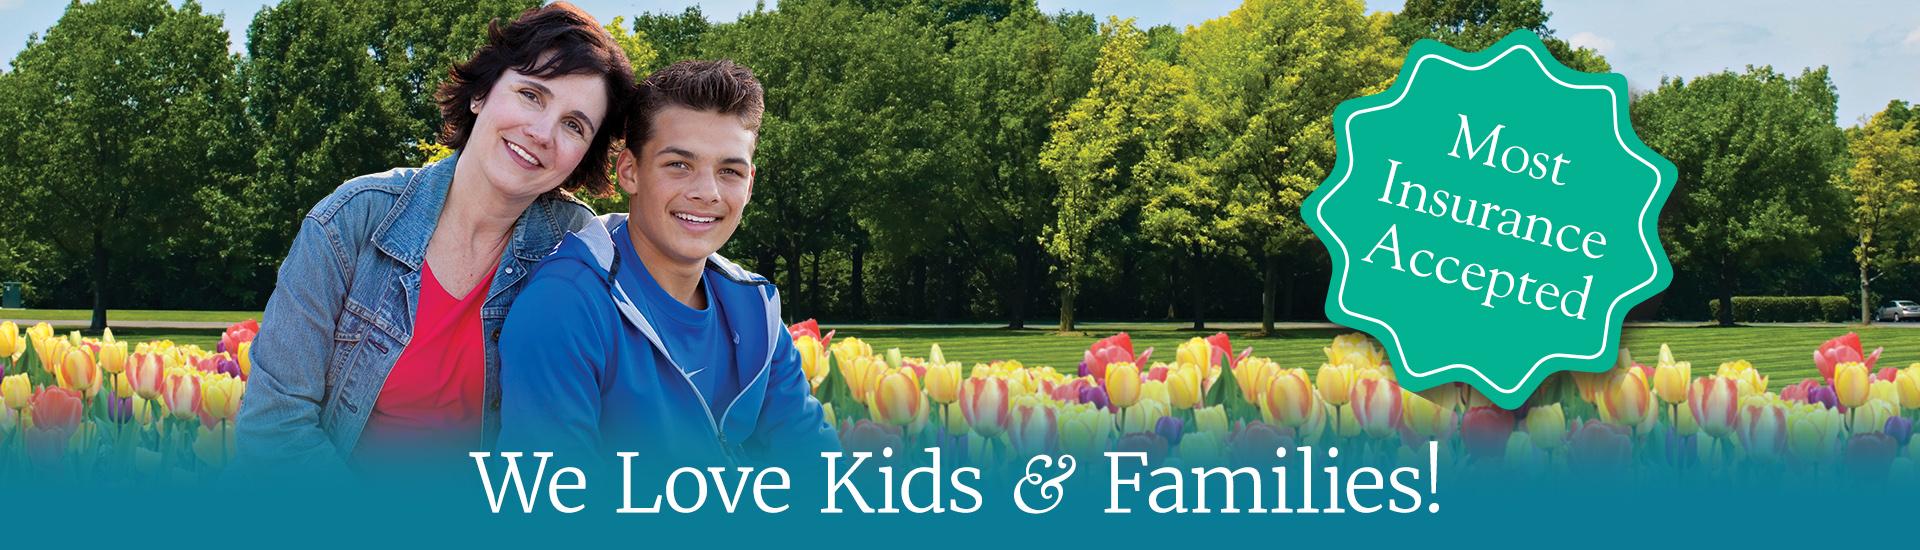 We Love Kids & Families